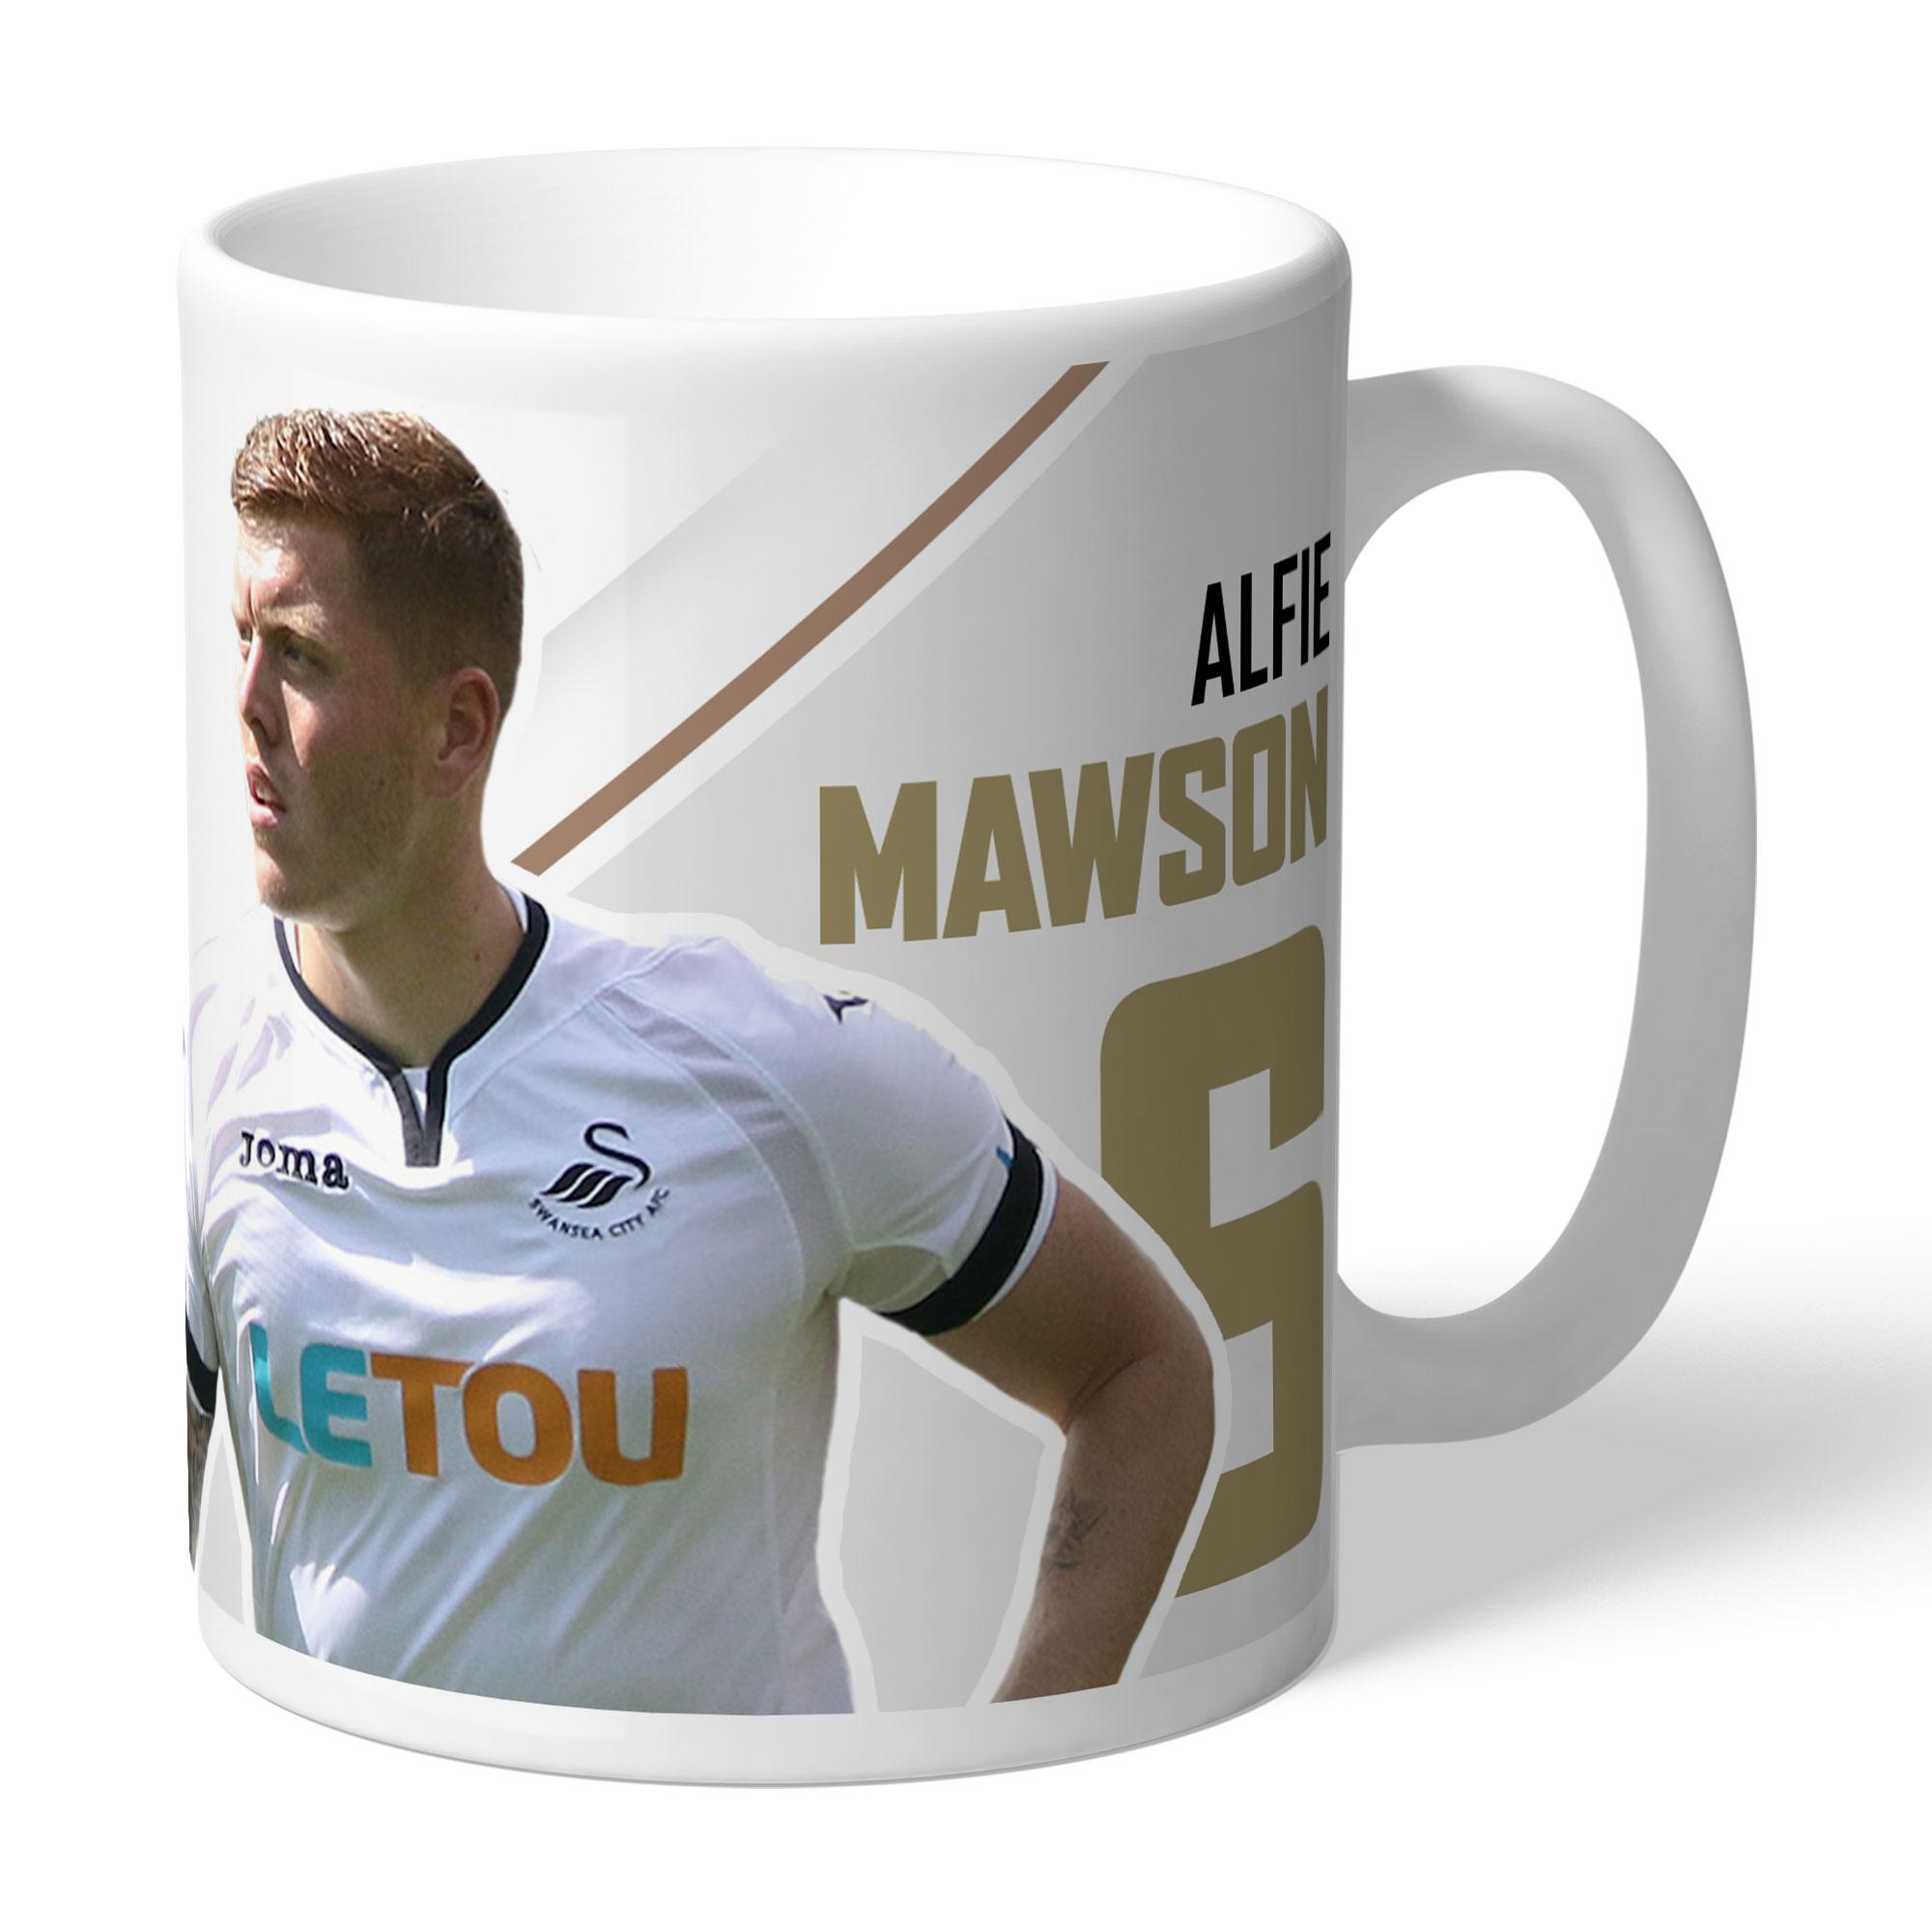 Swansea City AFC Mawson Autograph Mug